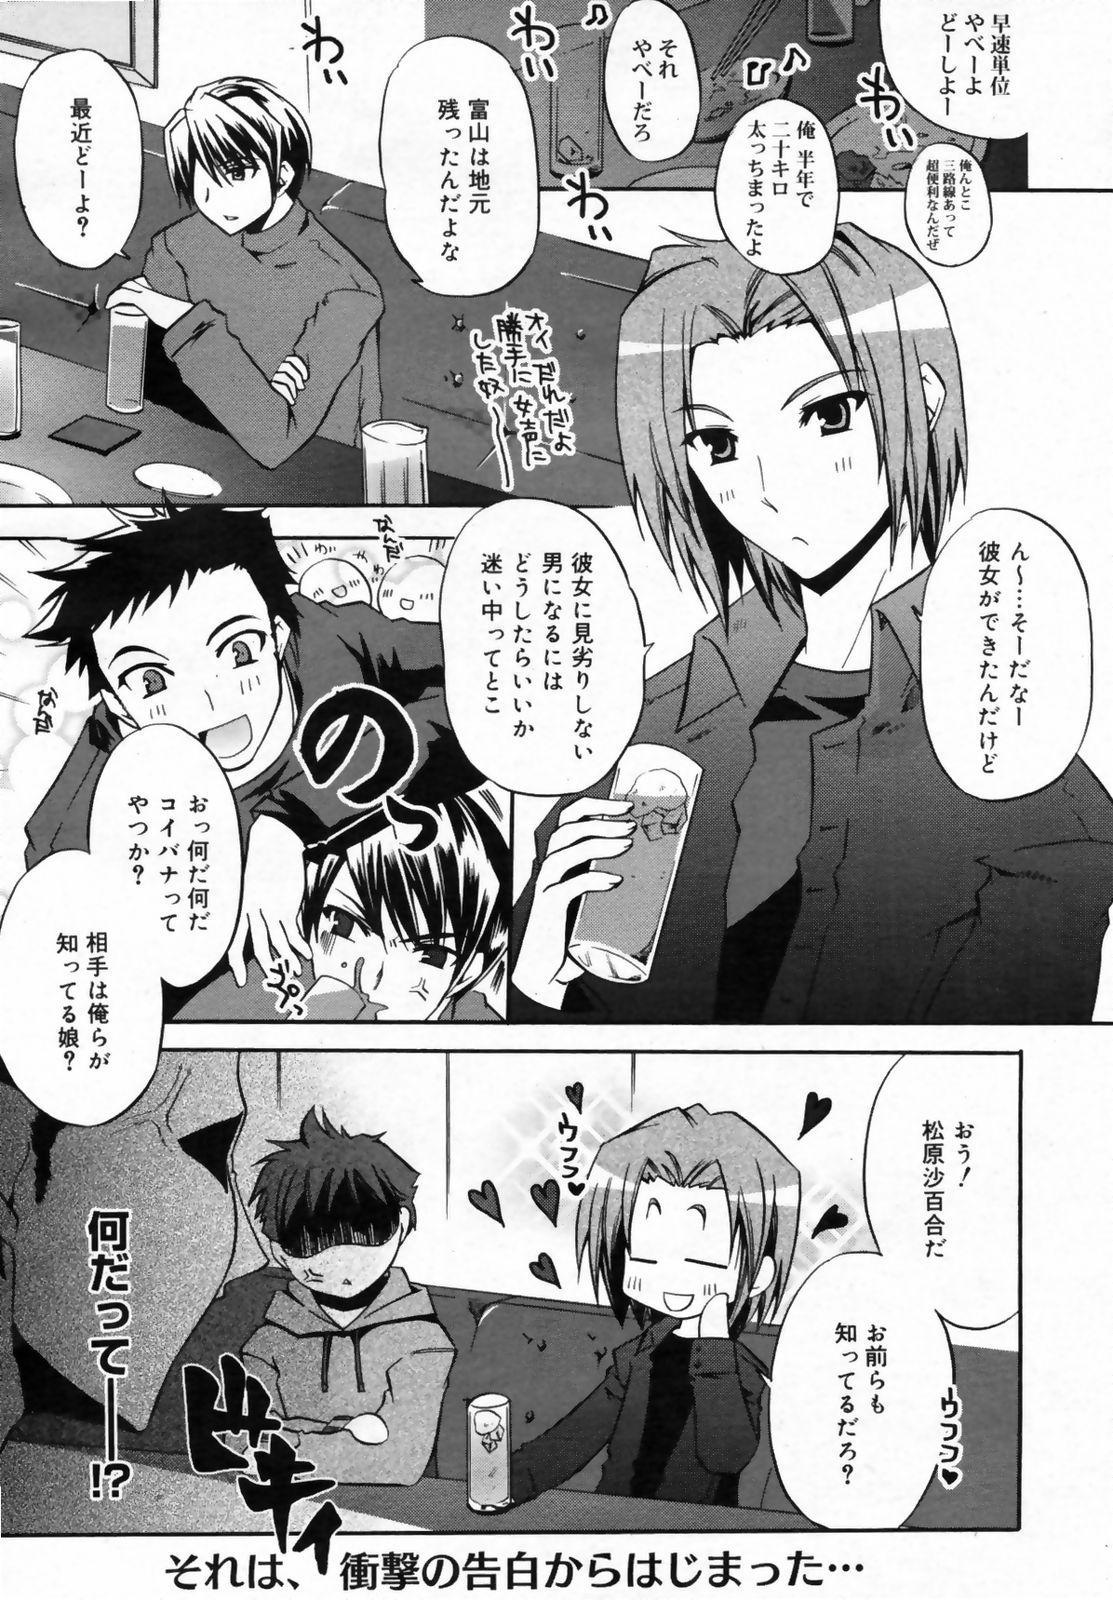 Manga Bangaichi 2009-02 Vol. 234 38